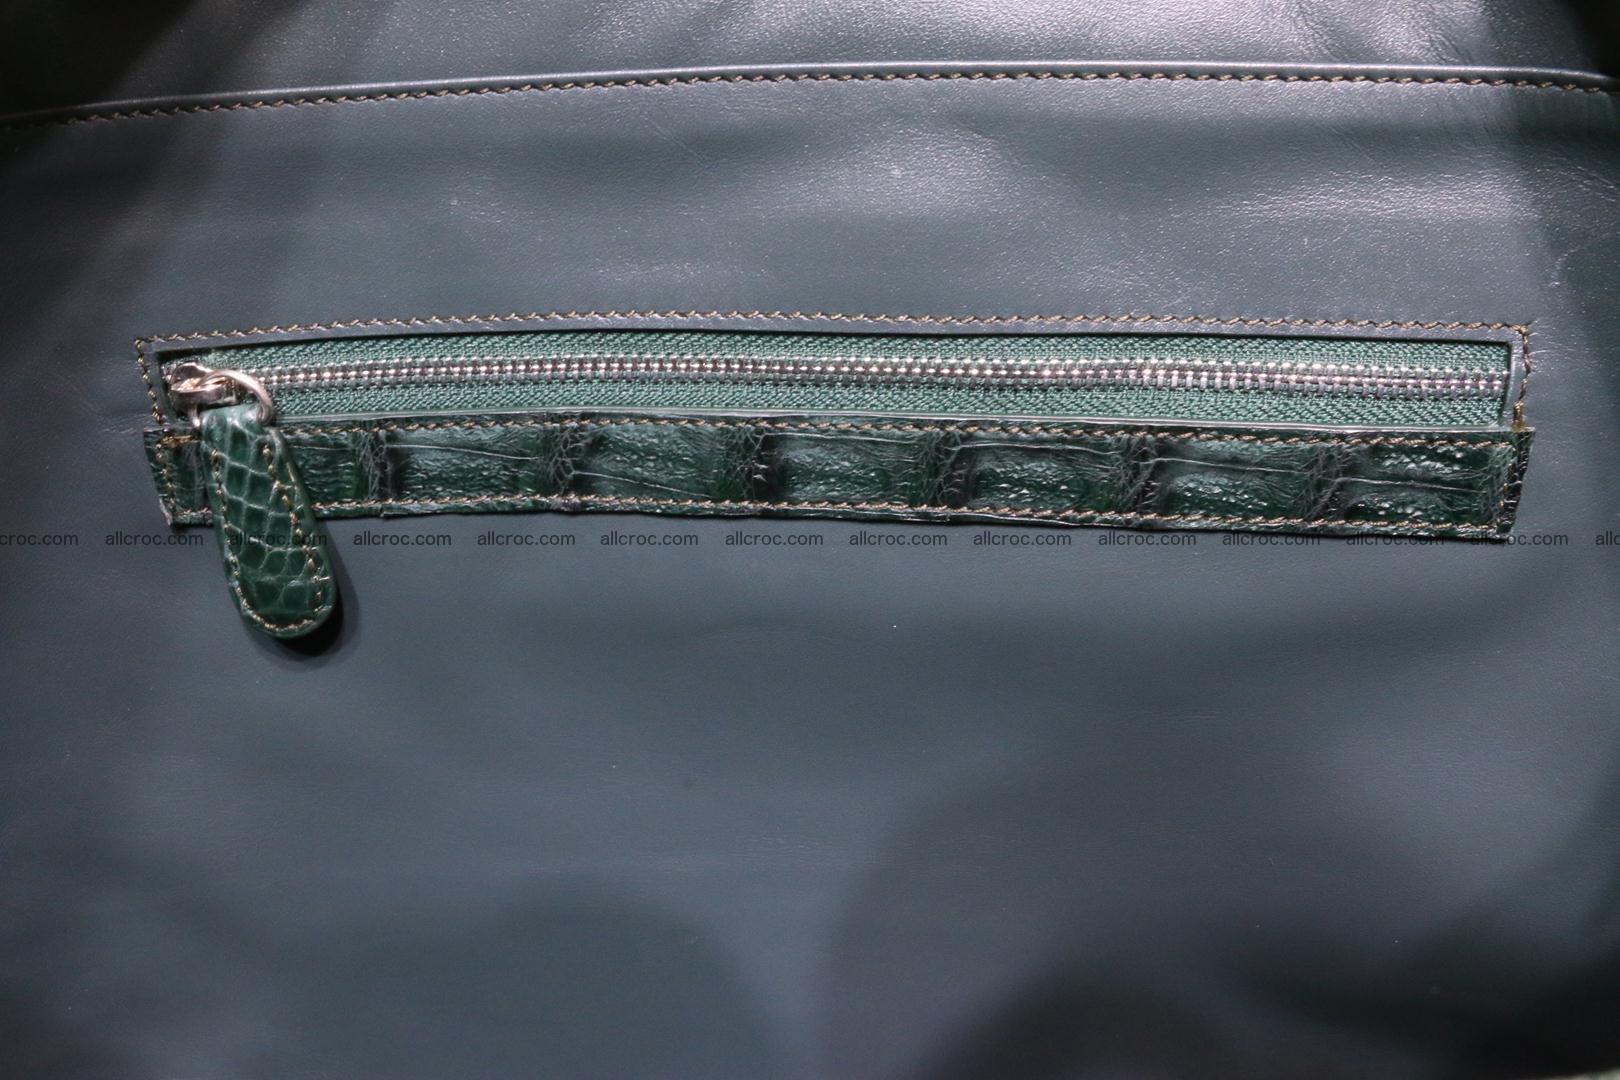 Genuine crocodile leather women's bag 064 Foto 14